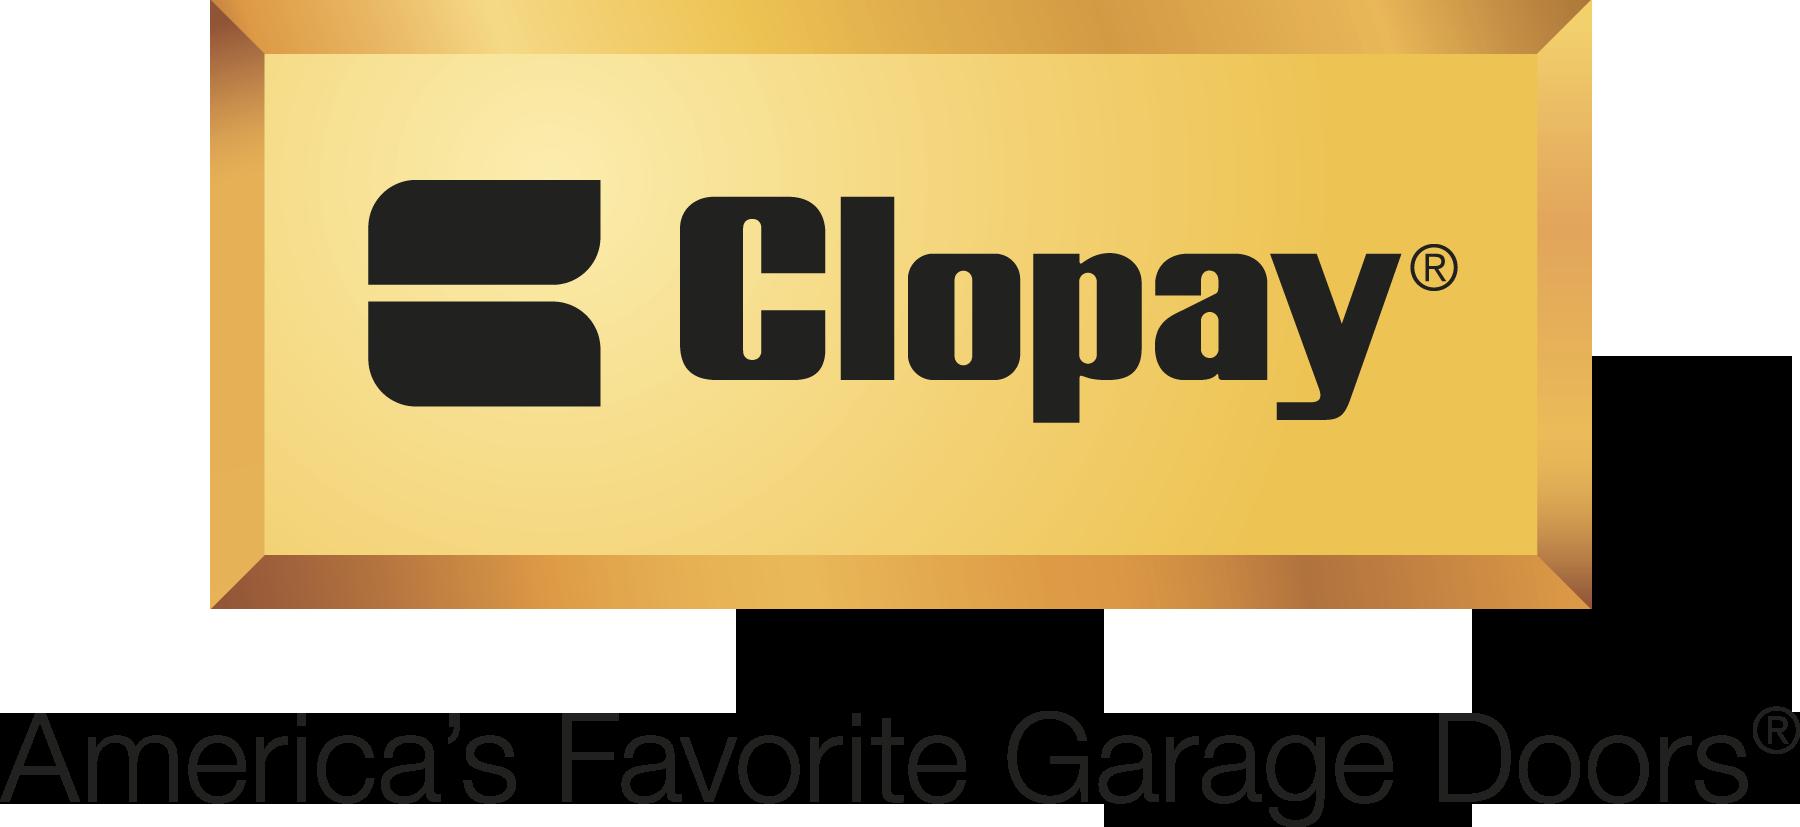 Residential | Dondi's Garage Door Solutions, LLC